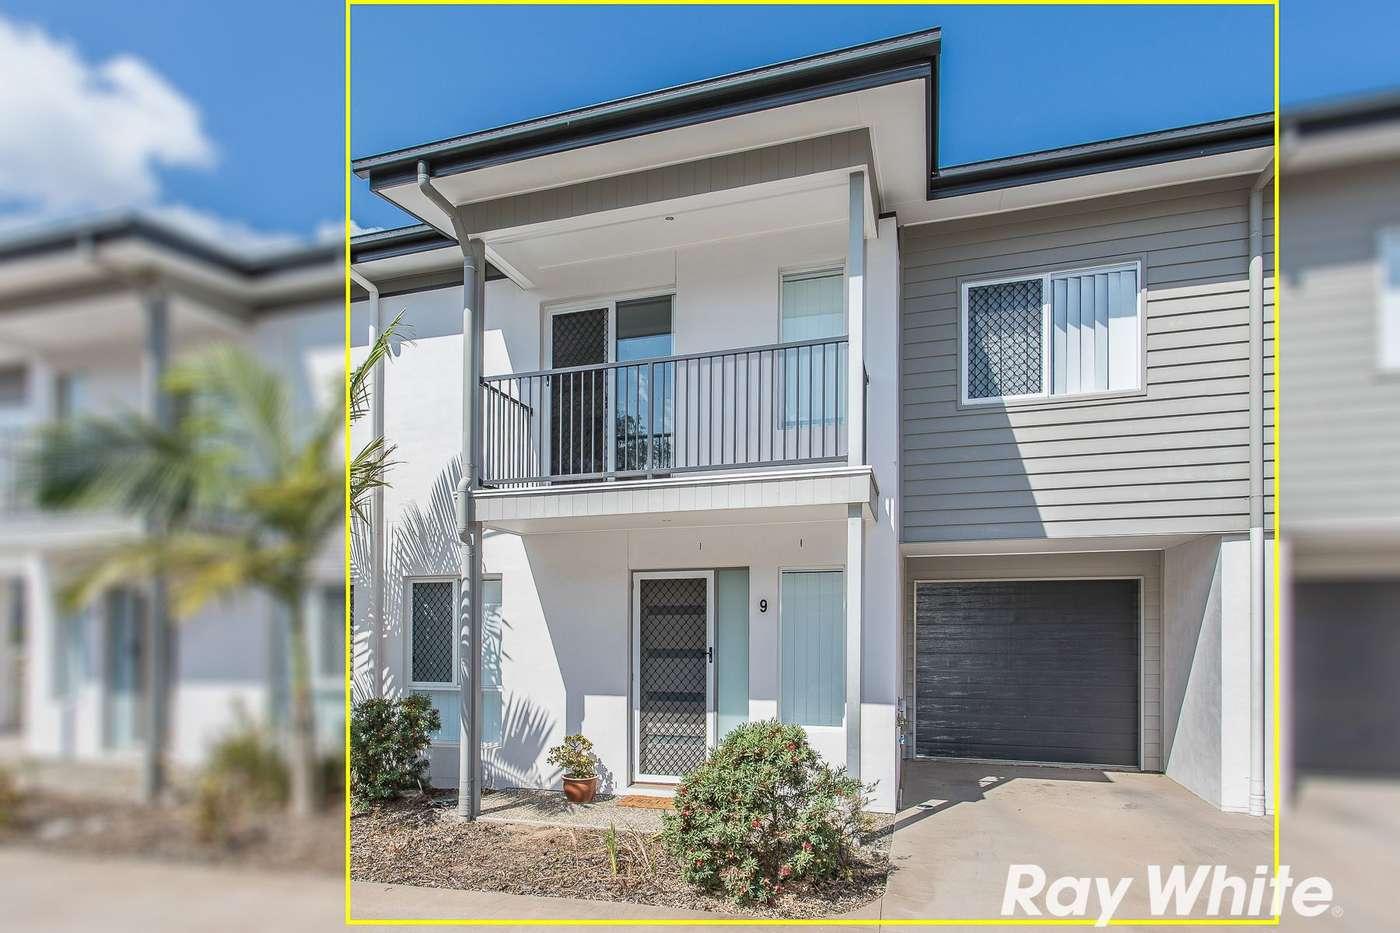 Main view of Homely house listing, 9/2 Lemur Parade, Dakabin, QLD 4503